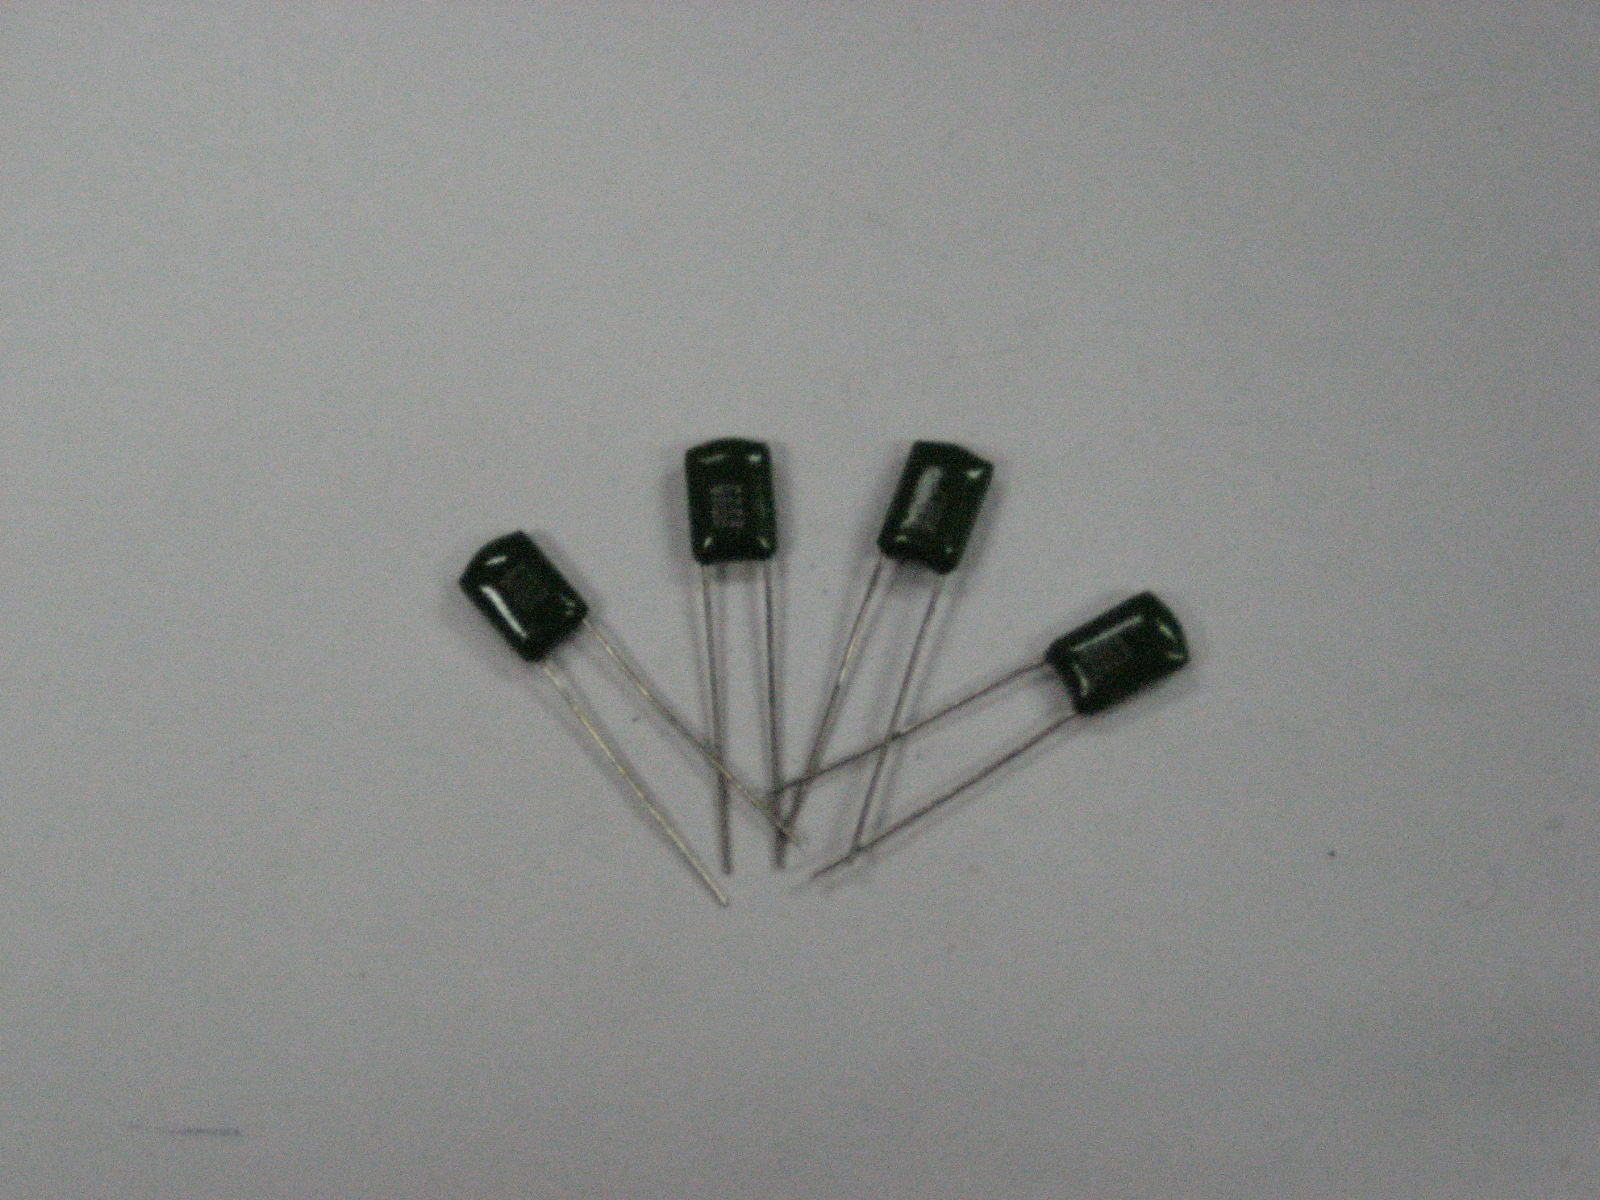 CL11聚酯膜电容器 CL111200V332 HY